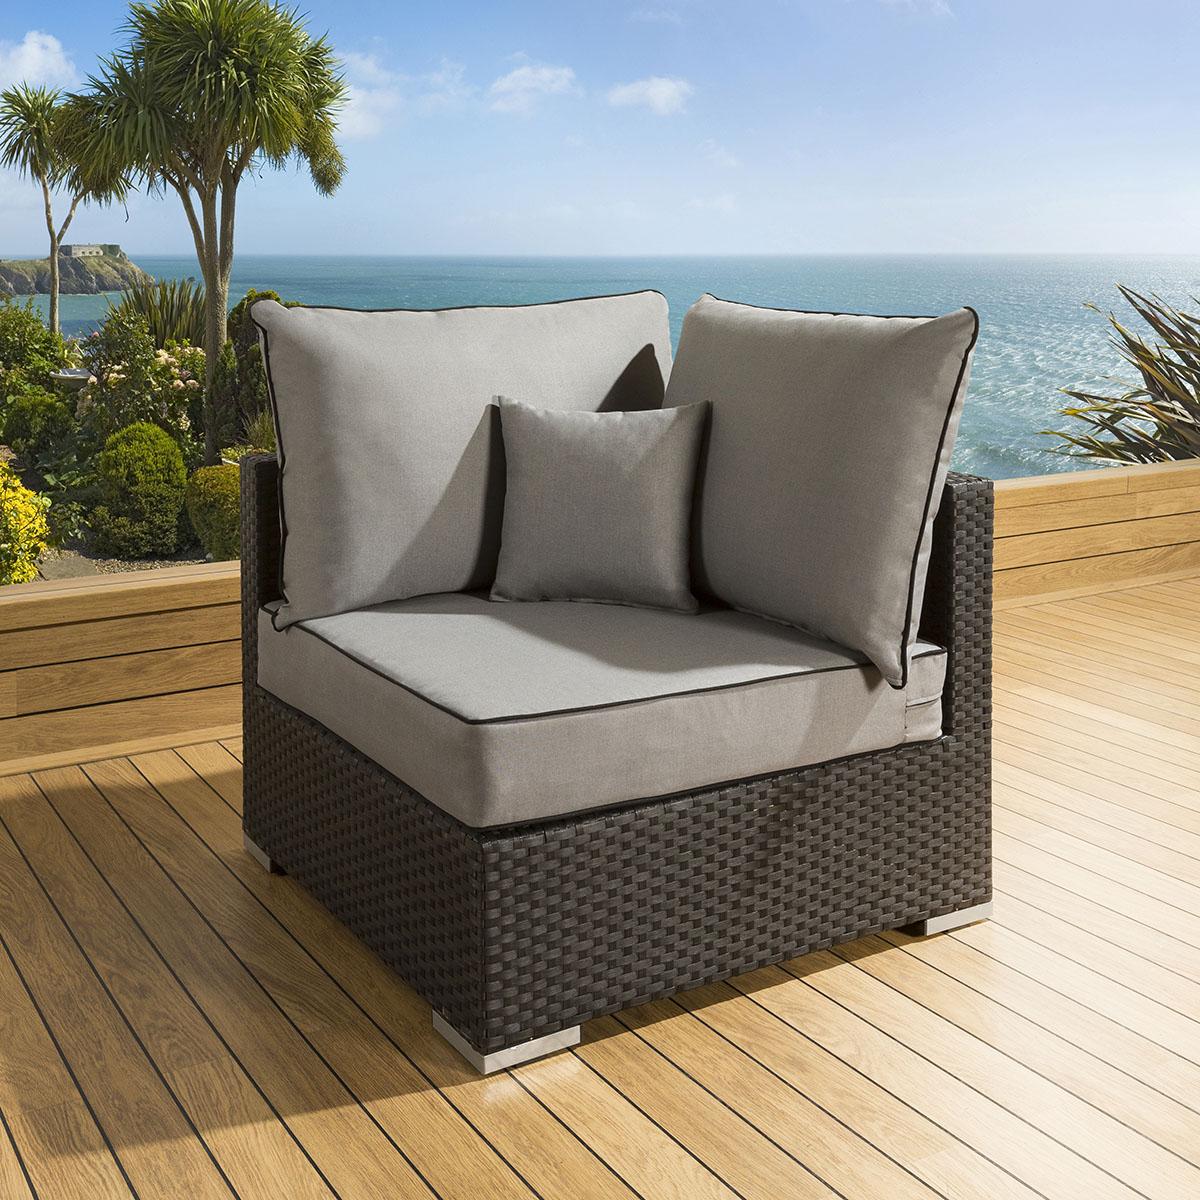 Rattan Furniture Corner Sofa Ebay: Luxury Outdoor Garden Sofa Piece Rattan Black / Grey